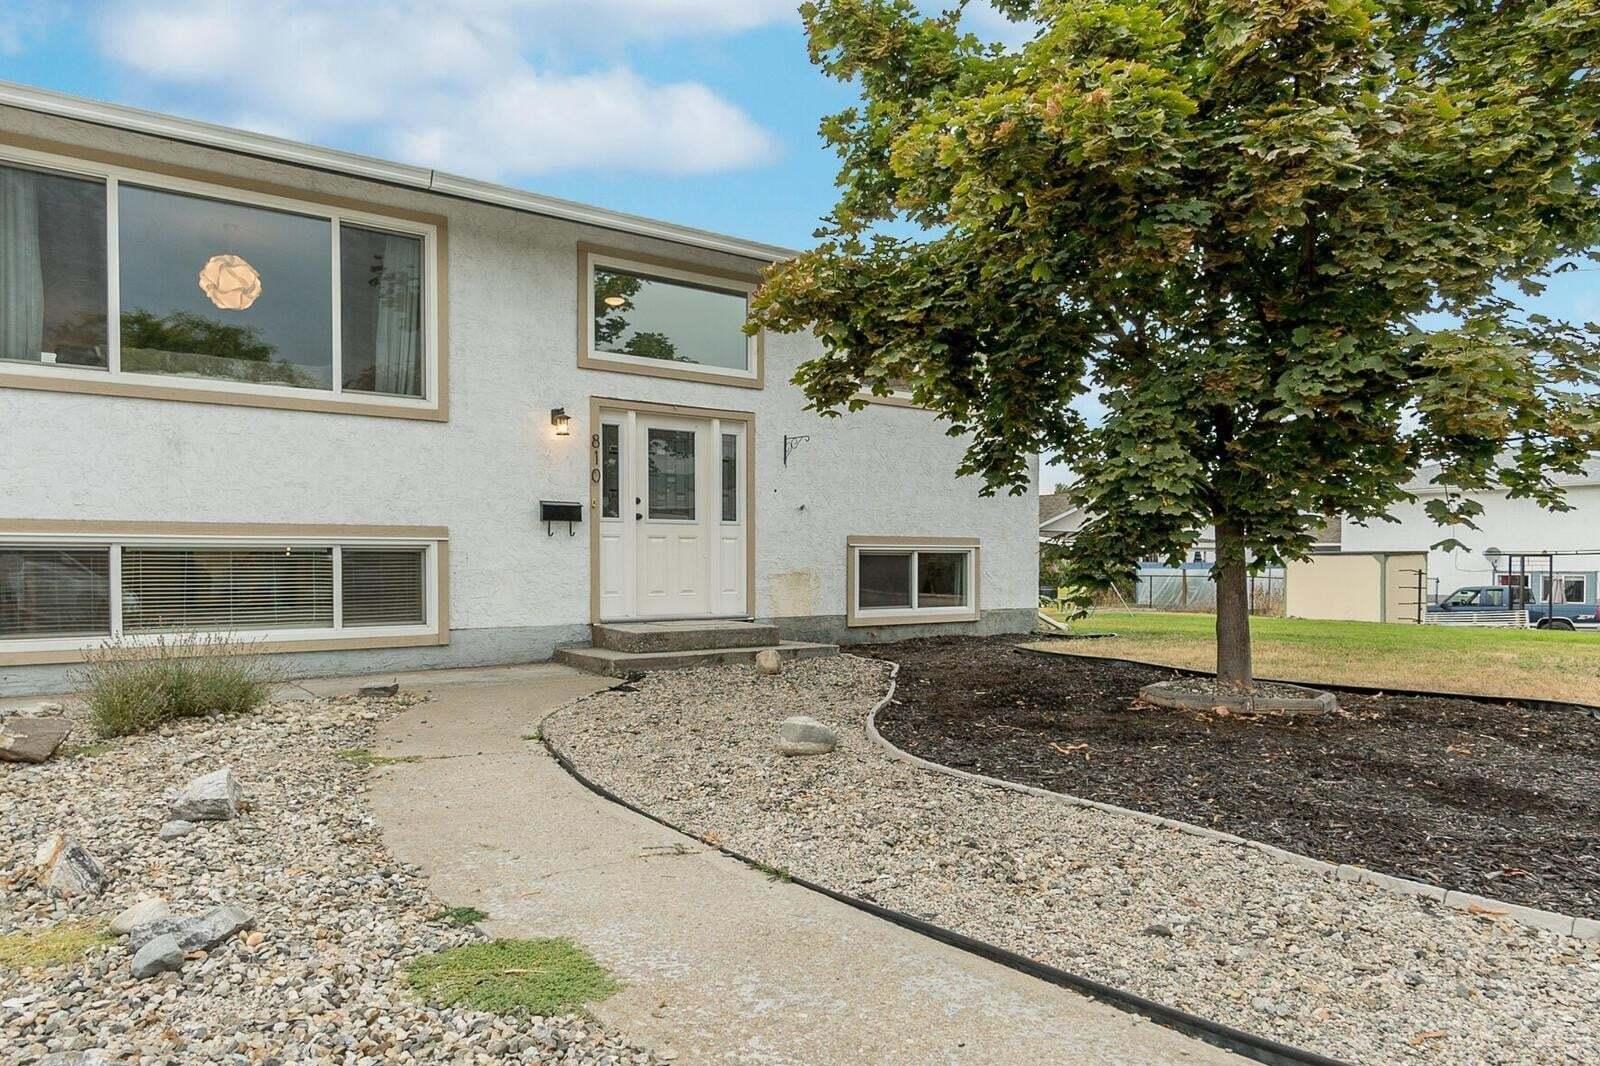 House for sale at 810 Tartan Rd Kelowna British Columbia - MLS: 10215486